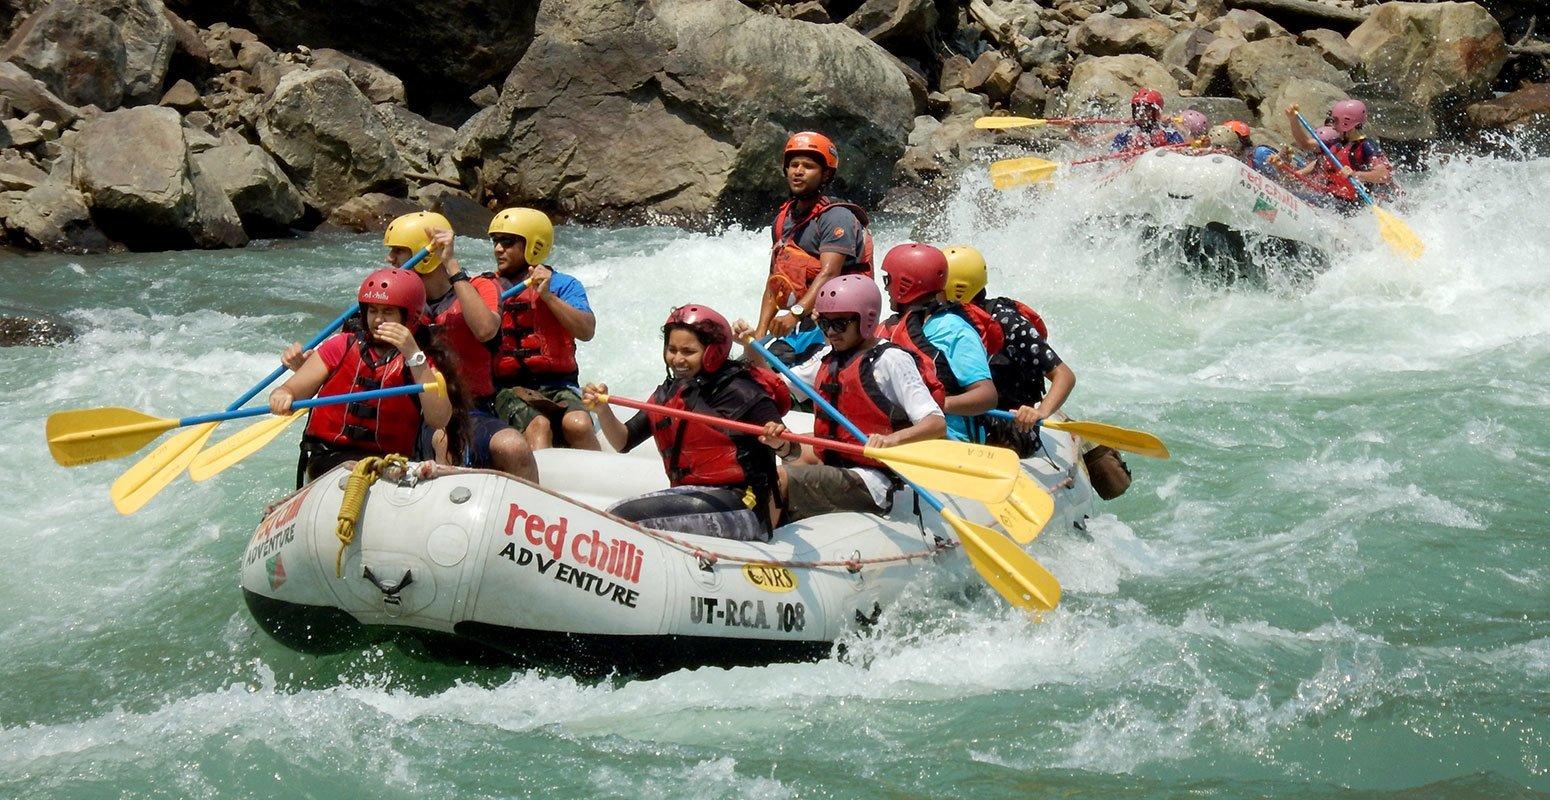 Ganga River Rafting from Kaudiyala (Kodiyala) in Uttarakhand with ...